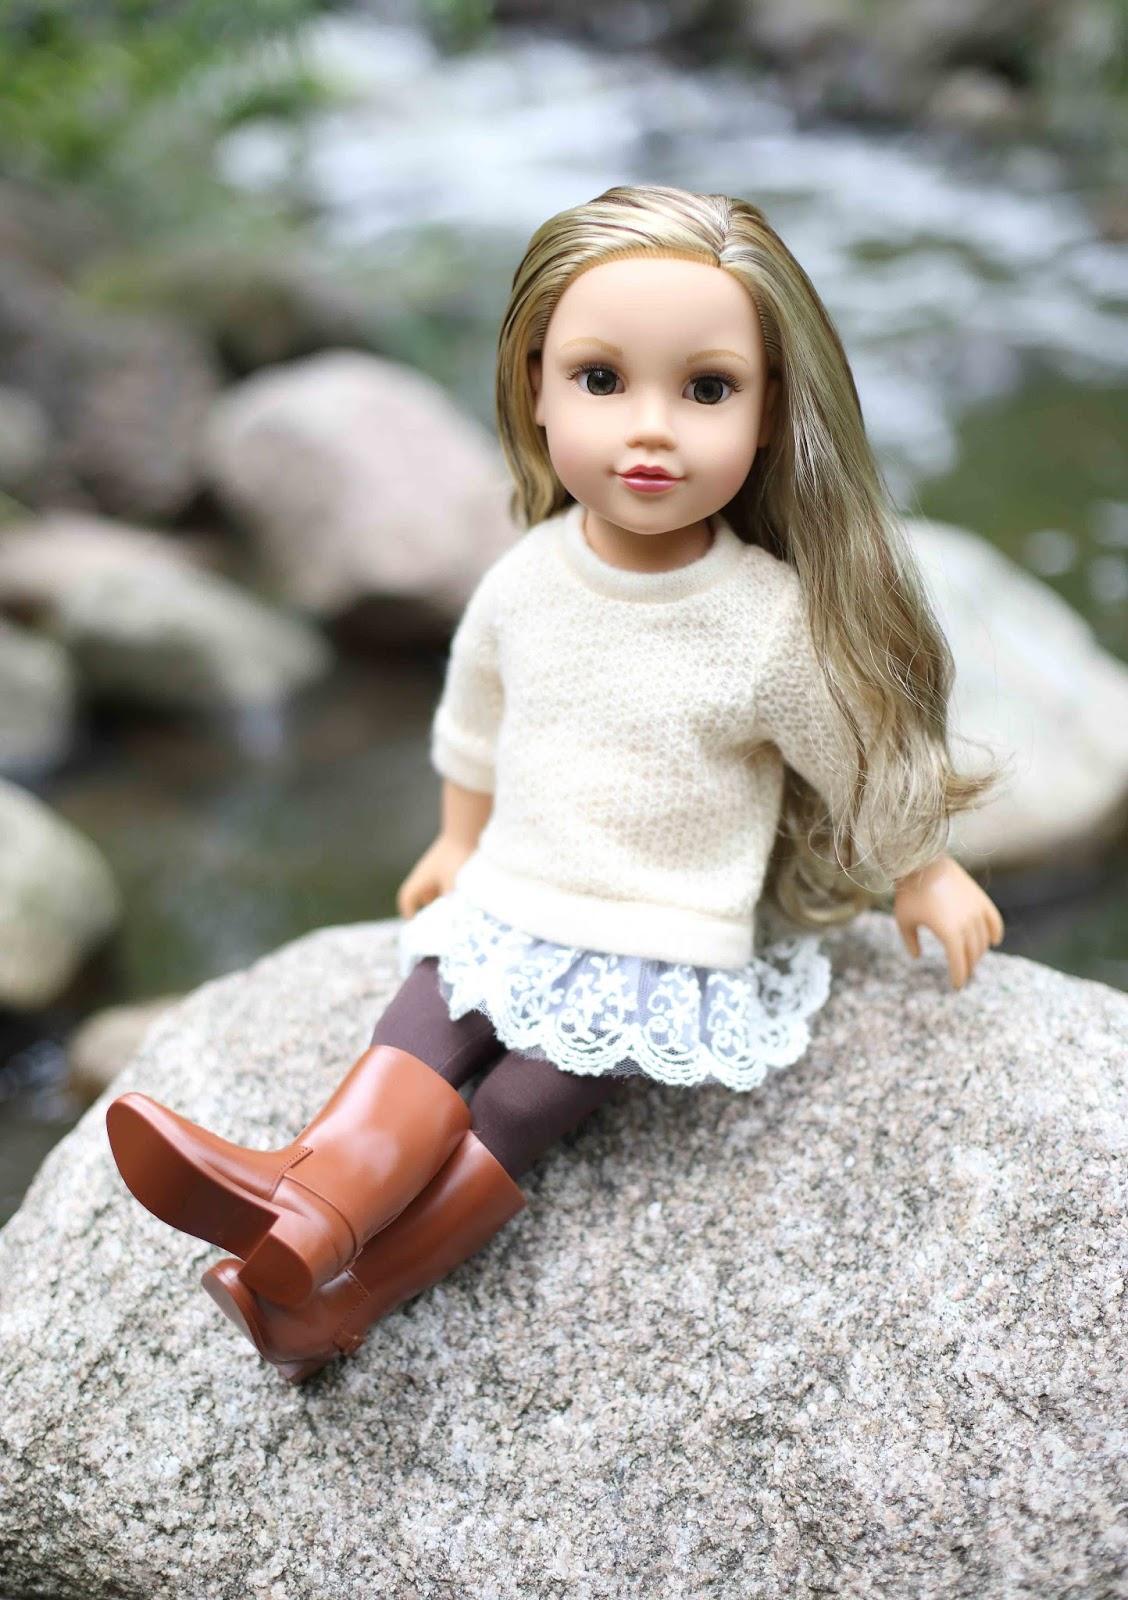 My Journey Girls Dolls Adventures: Danas new Journey Girl